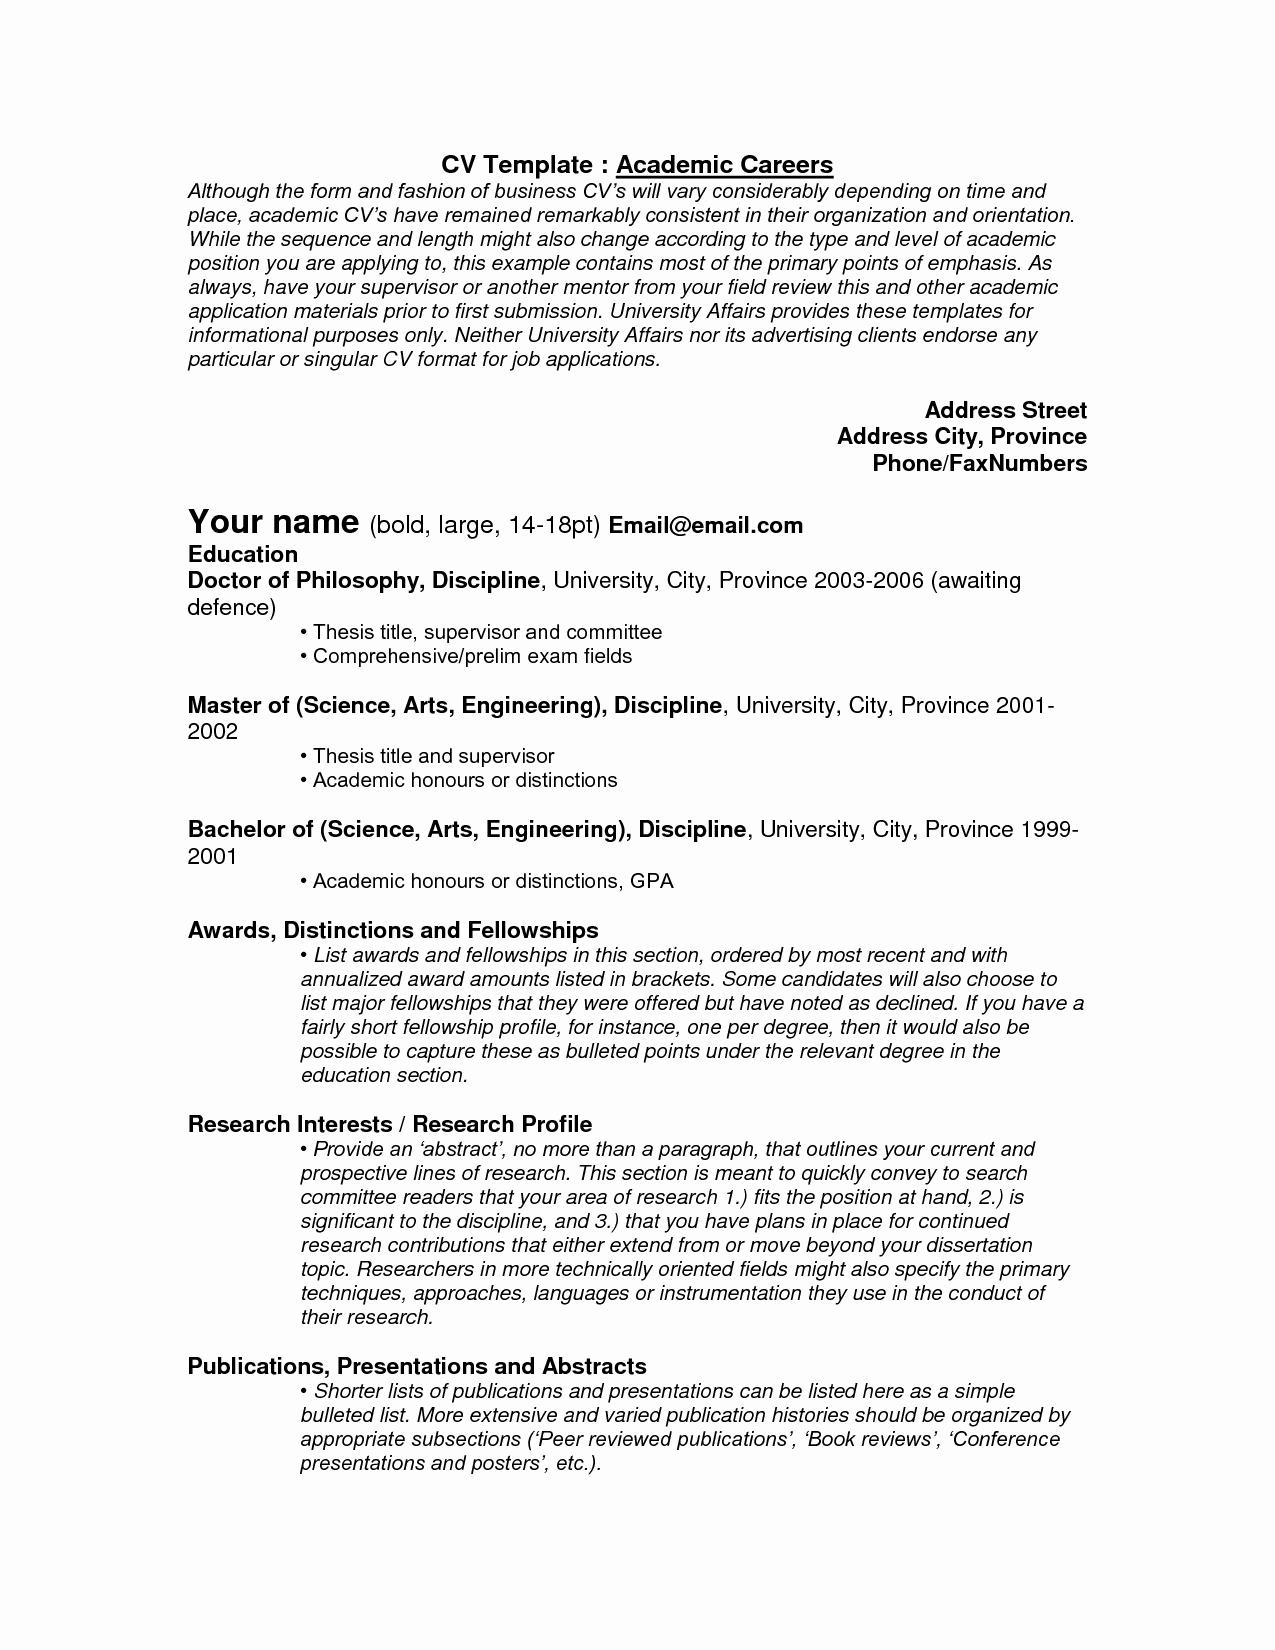 Academic Curriculum Vitae Template Inspirational Cv Templates Academic